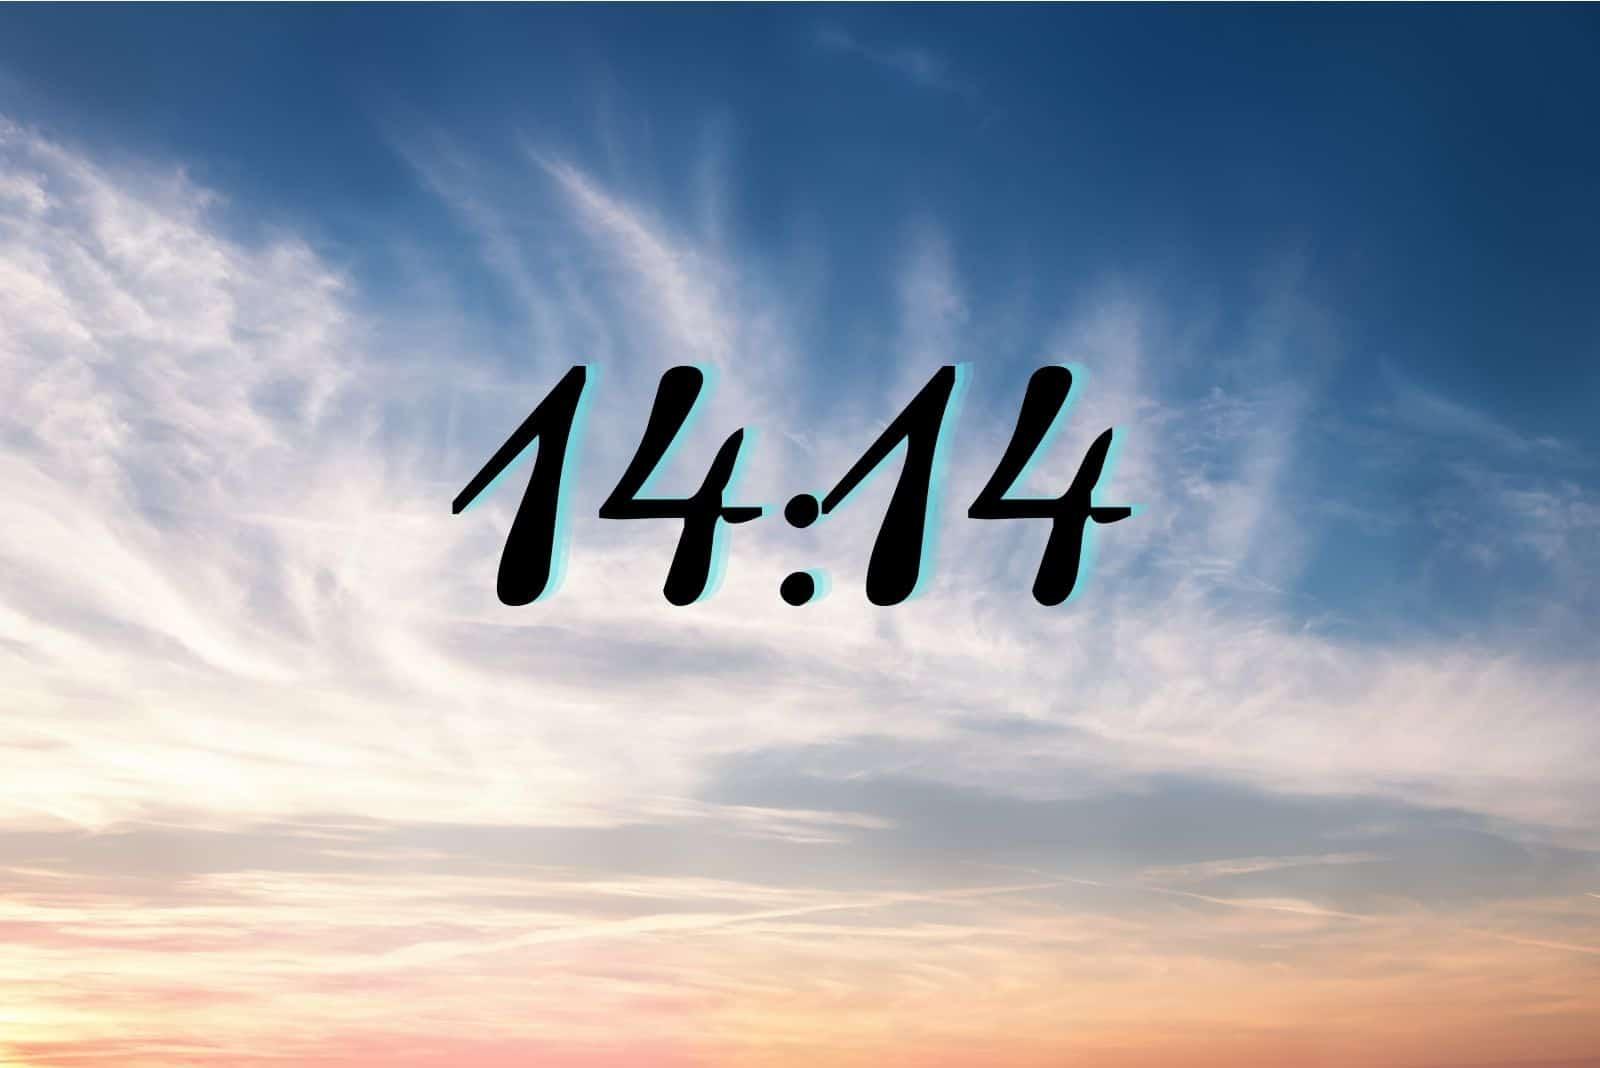 bewölkter blauer Himmel mit 14:14 Nummer am Himmel